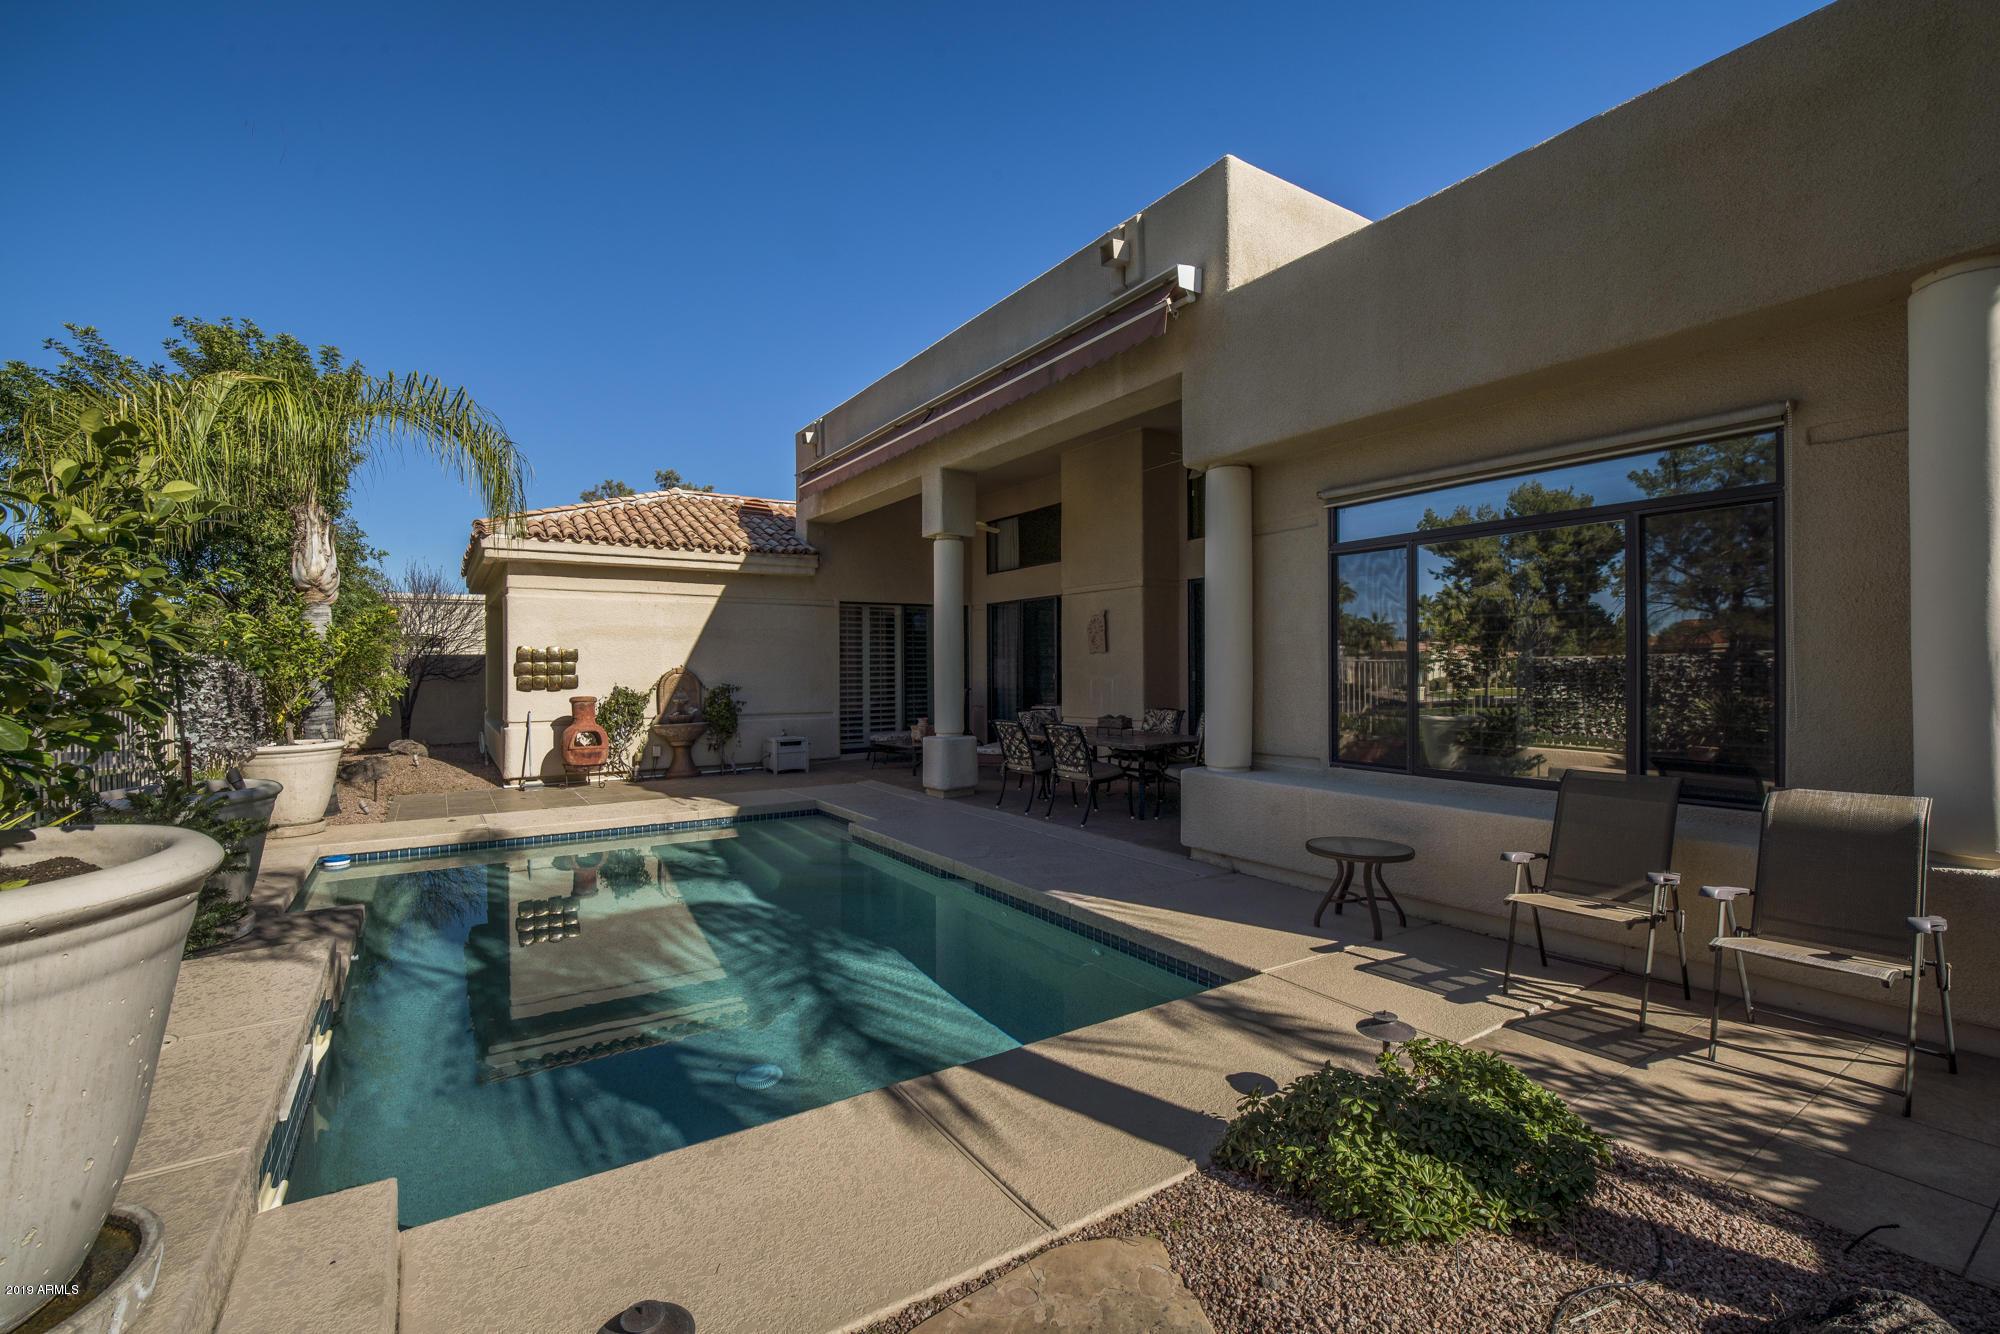 MLS 5964589 12086 N 81ST Street, Scottsdale, AZ 85260 Scottsdale AZ Private Pool